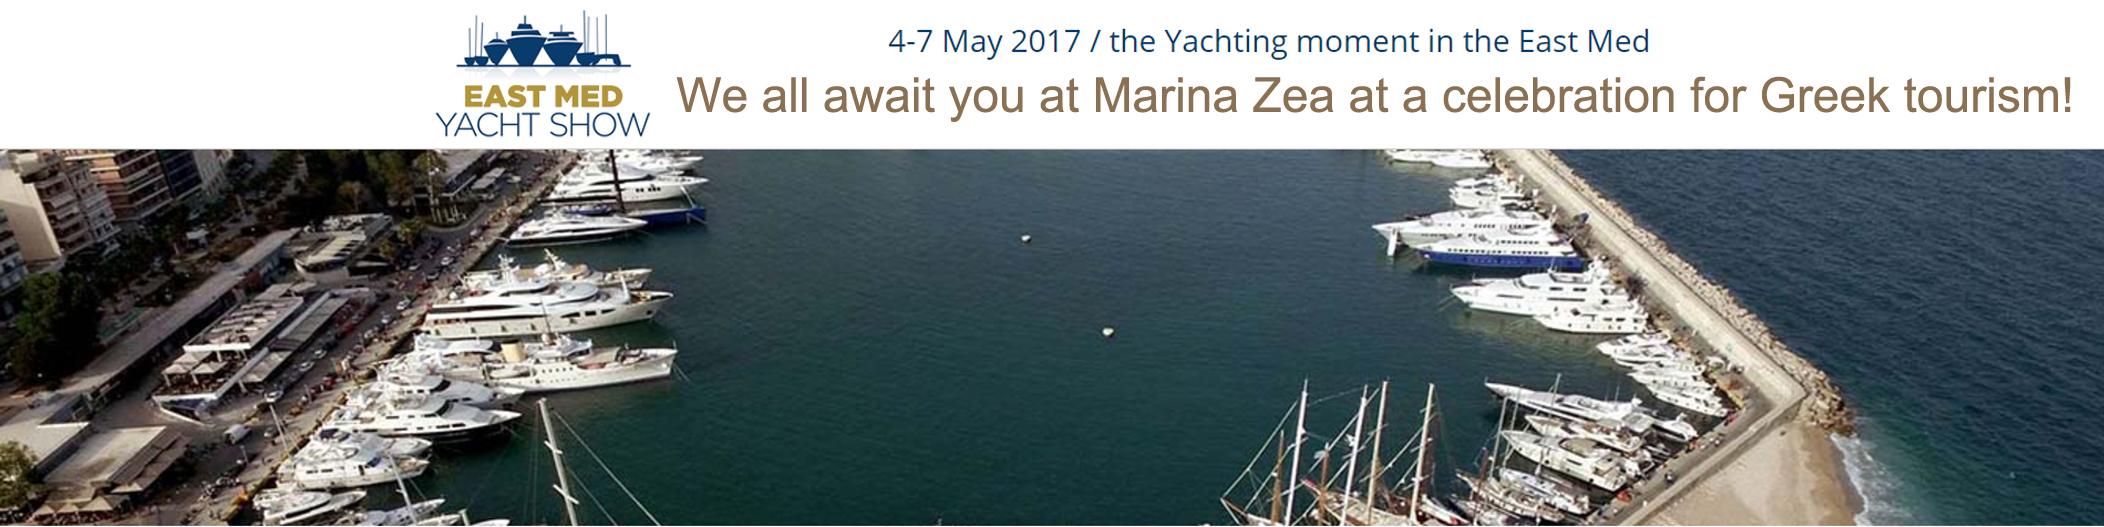 East Med Yacht Show 2017